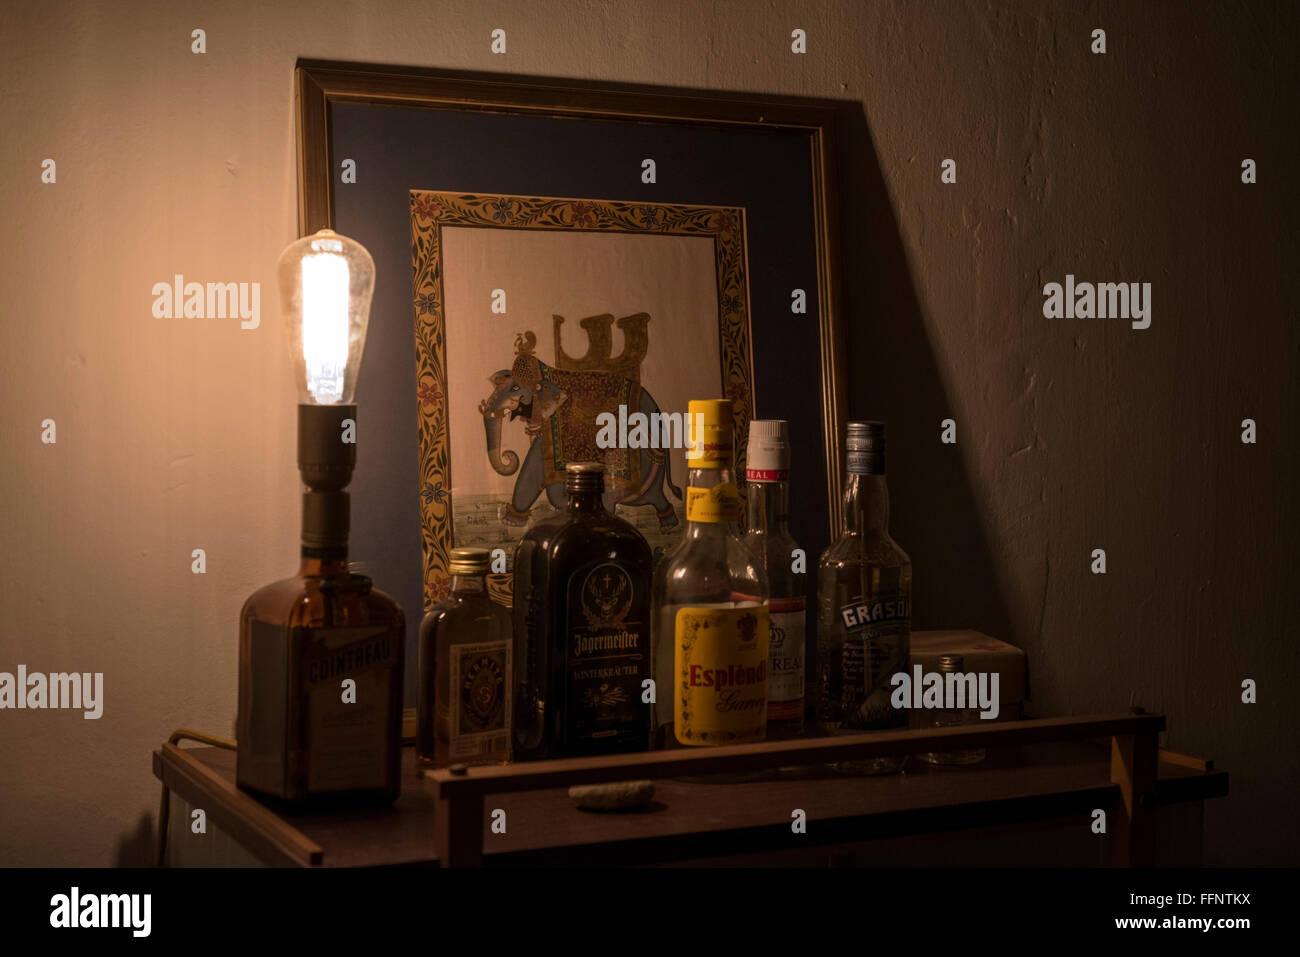 Themed Bar Stockfotos & Themed Bar Bilder - Alamy